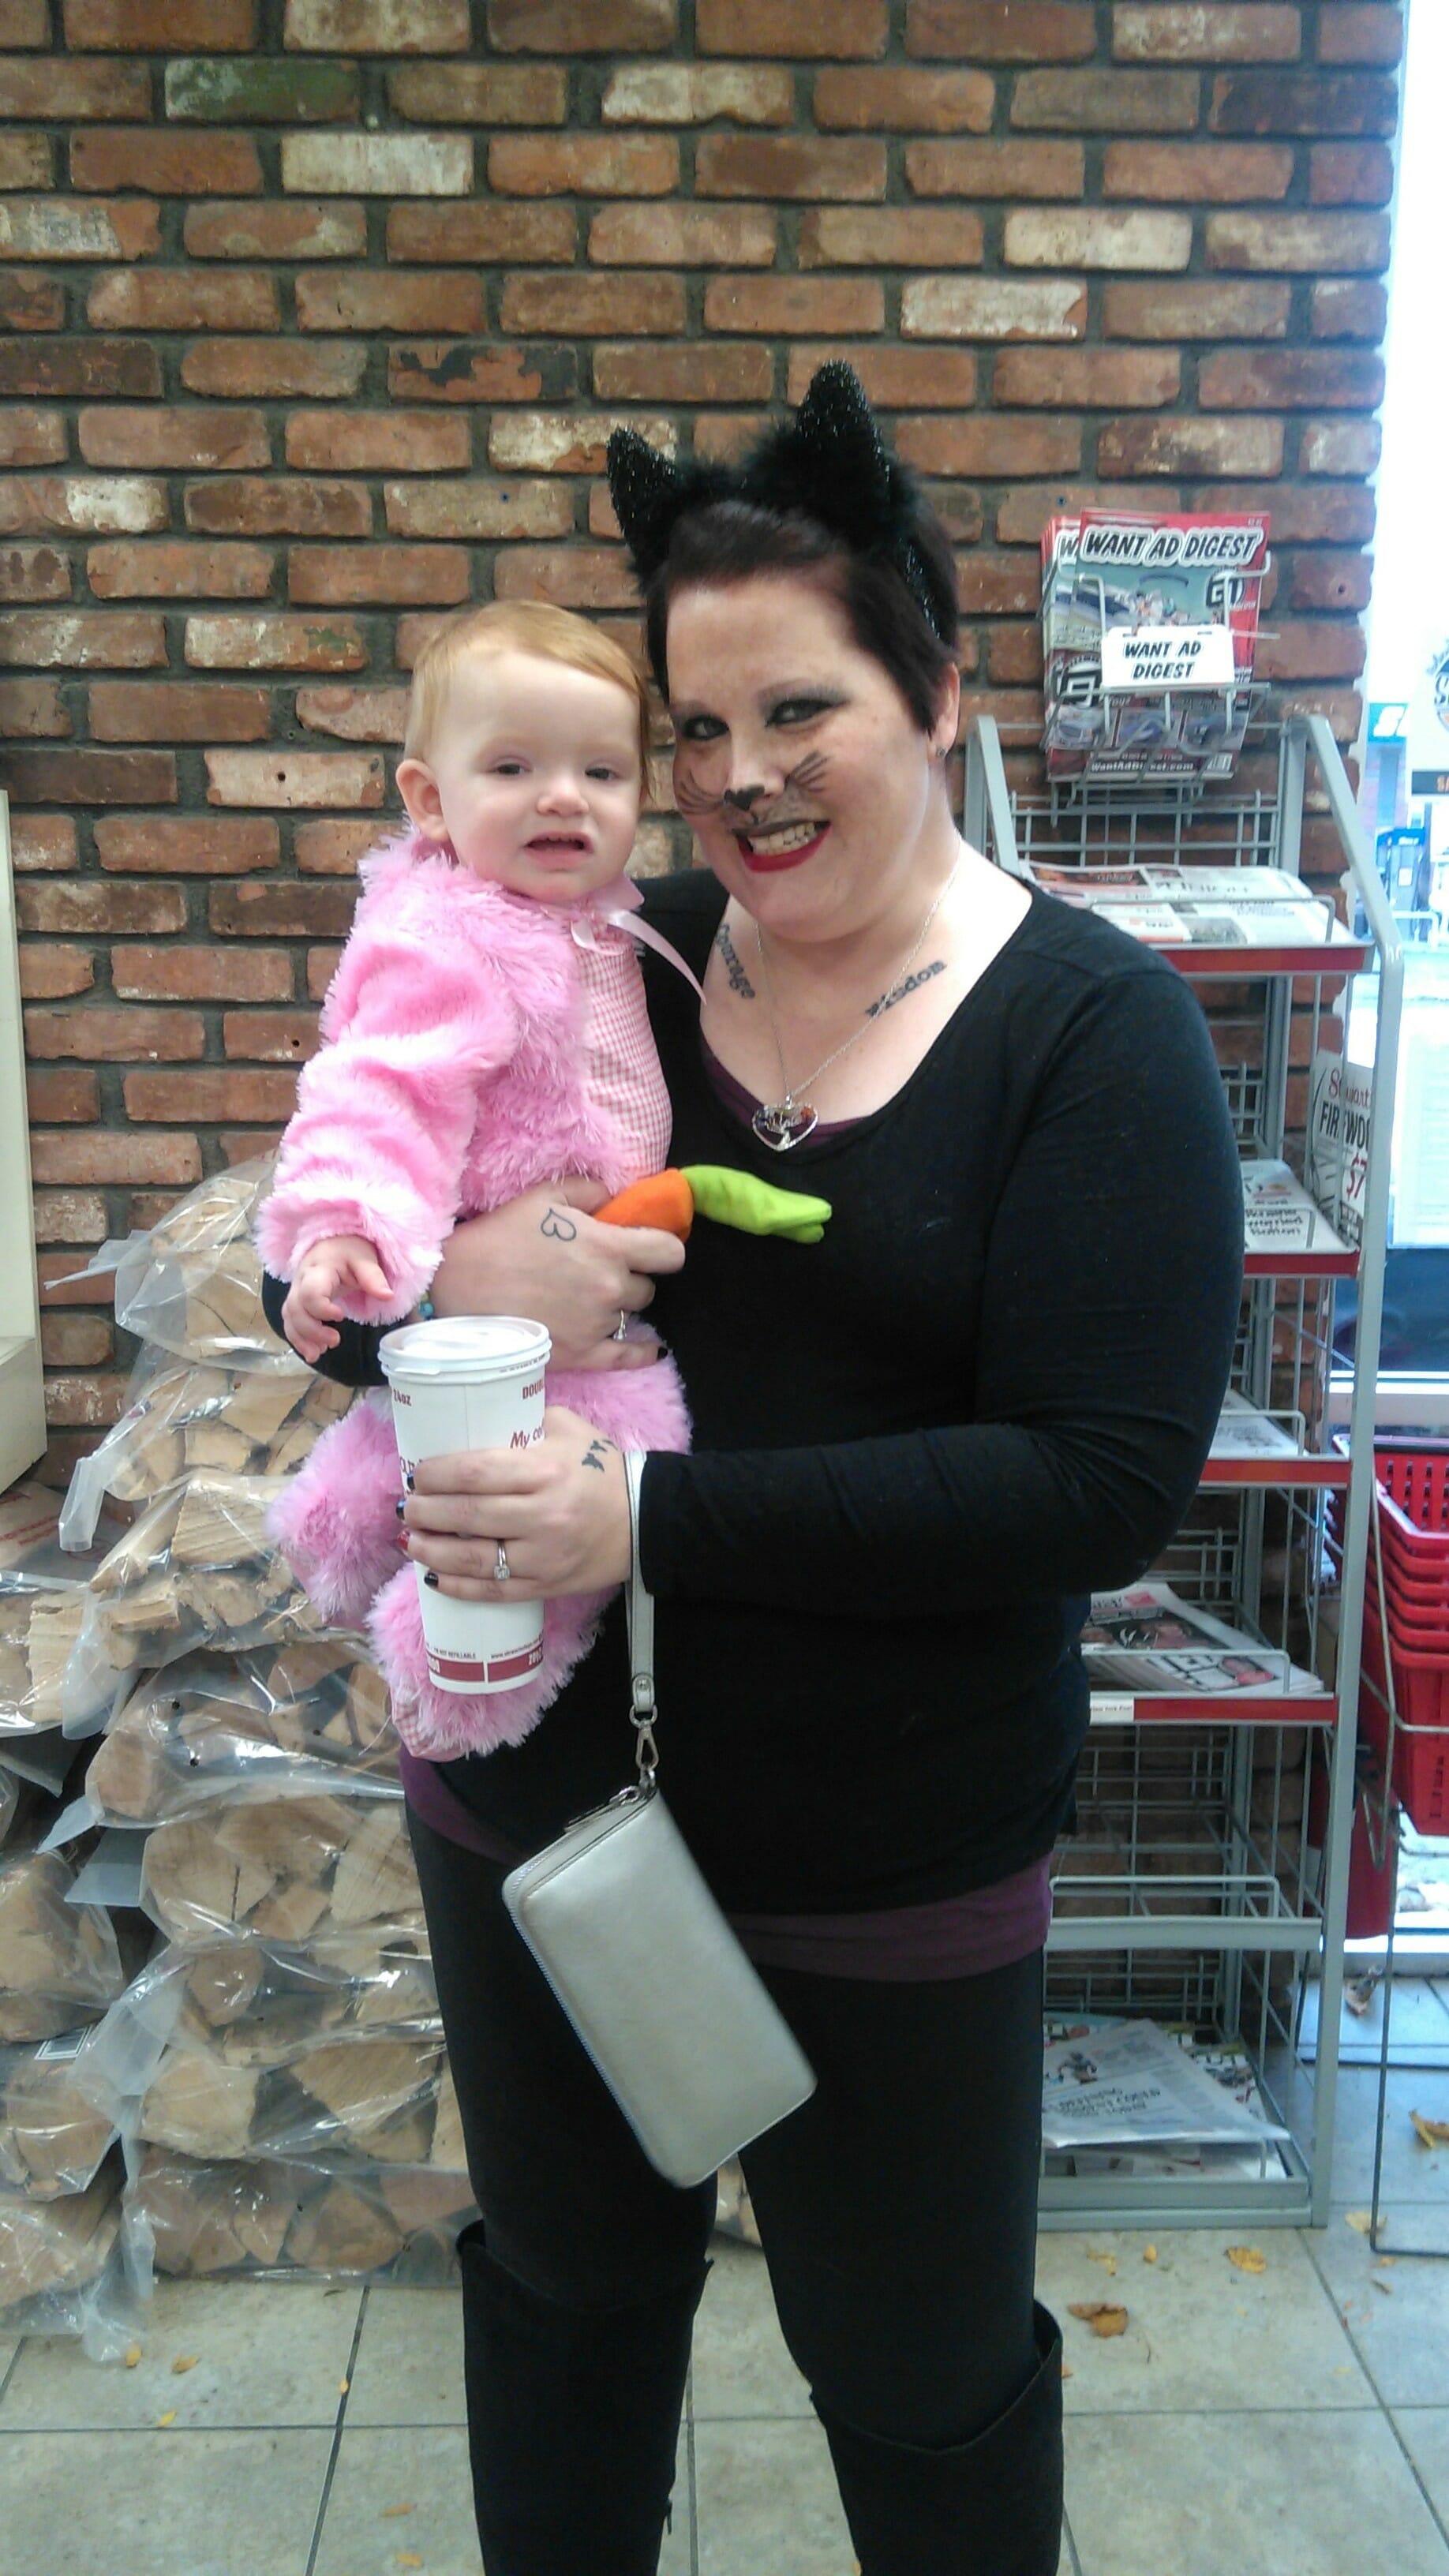 Halloween at Stewart's, family fun